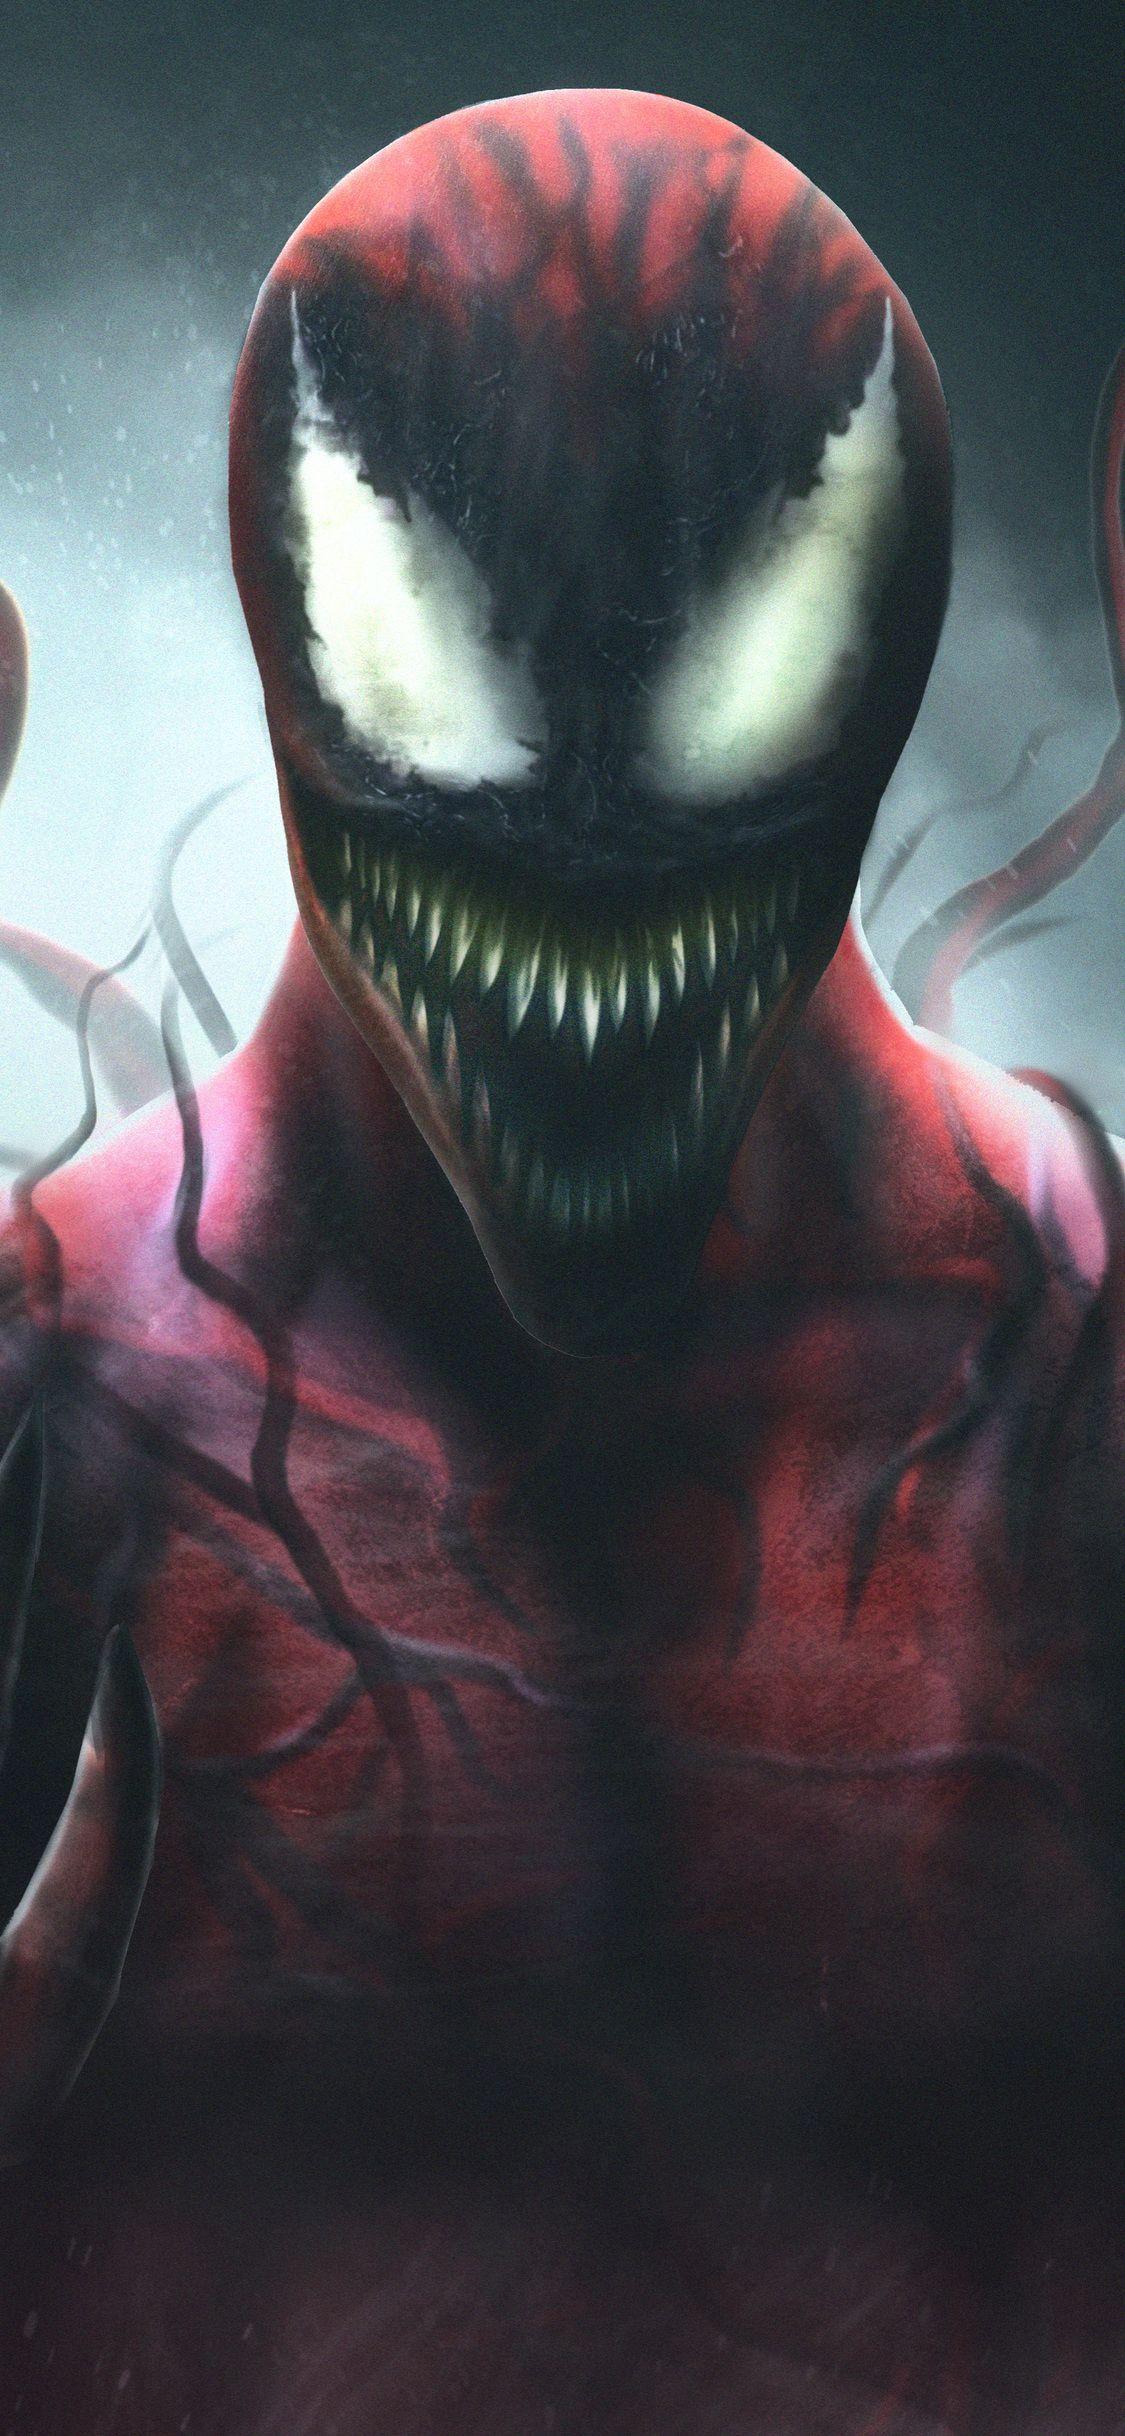 Venom 2 iPhone Hd Wallpapers - Wallpaper Cave